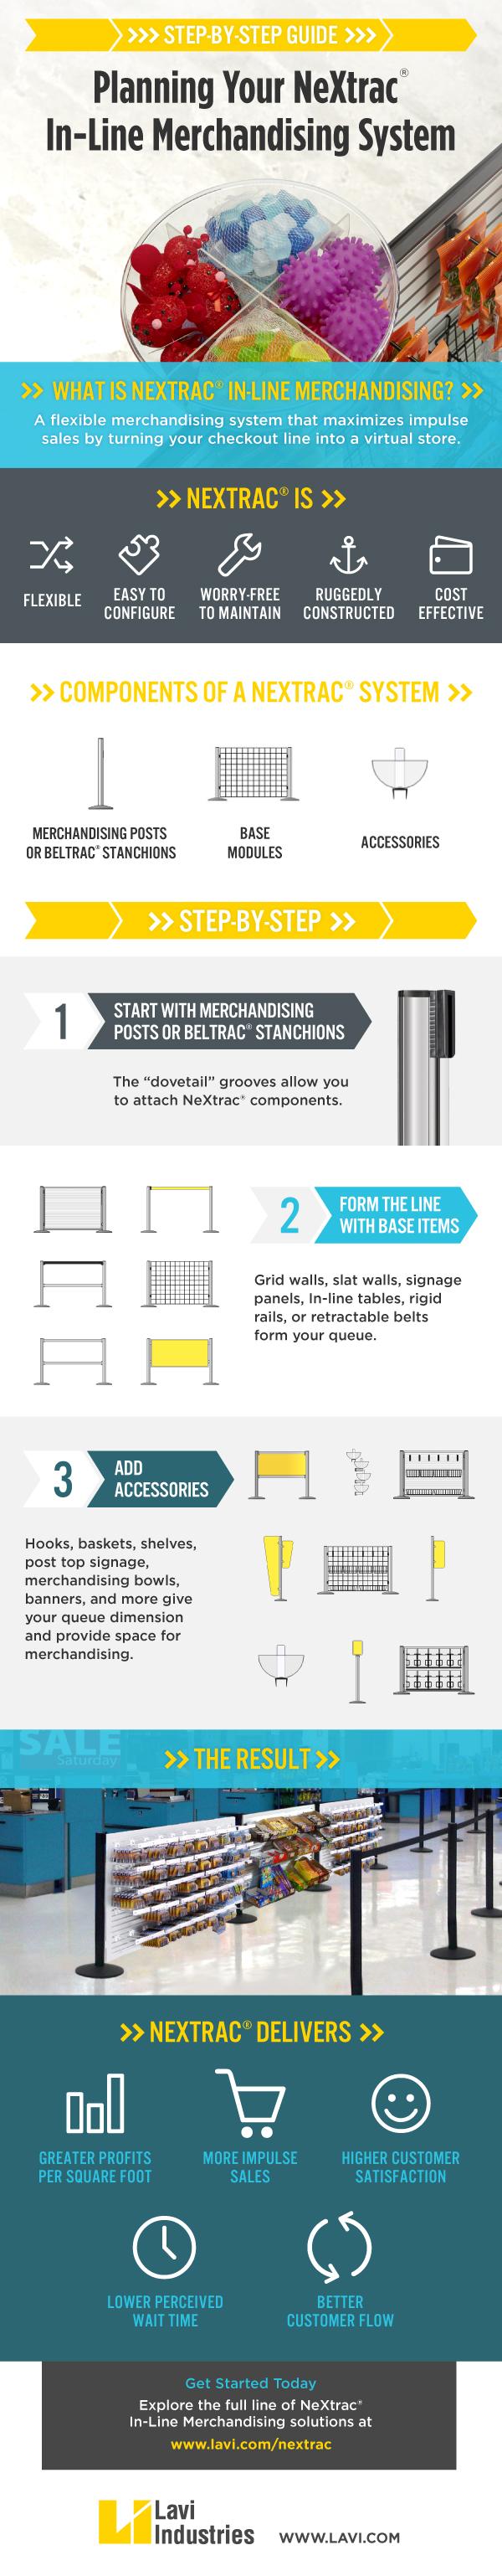 lavi merchandising infographic